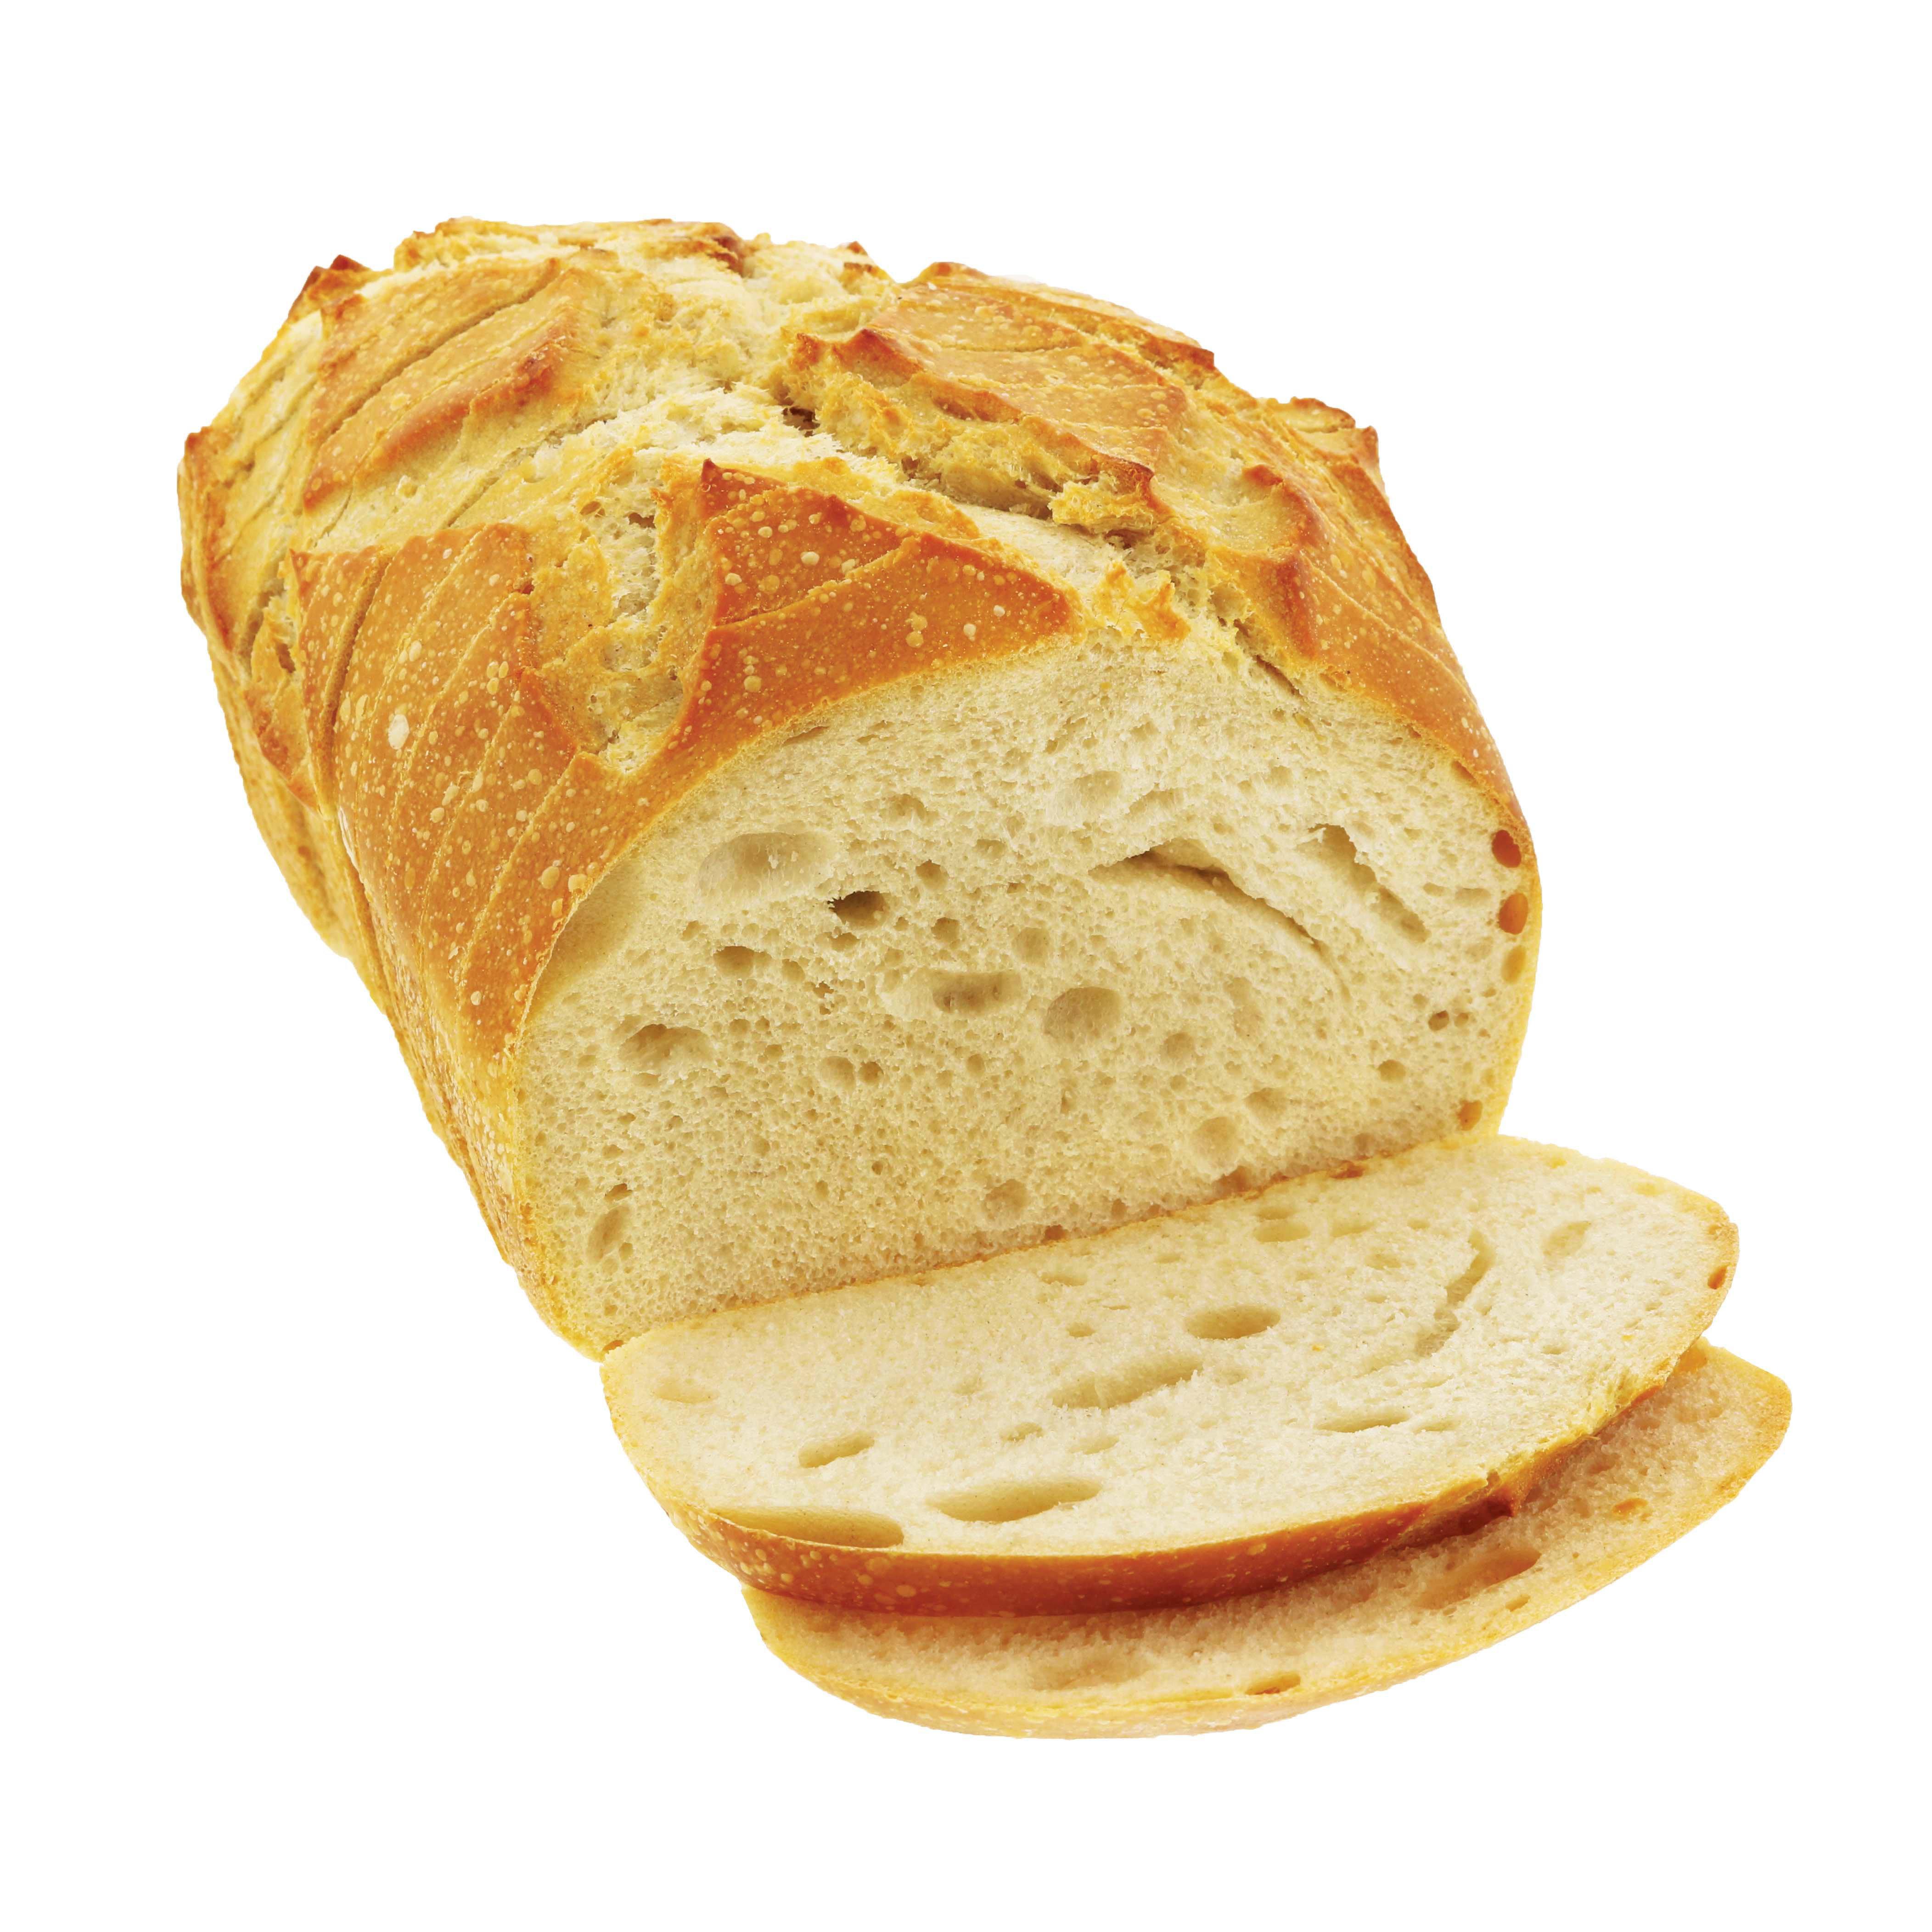 B Bakery Sourdough Bread Scratch Made